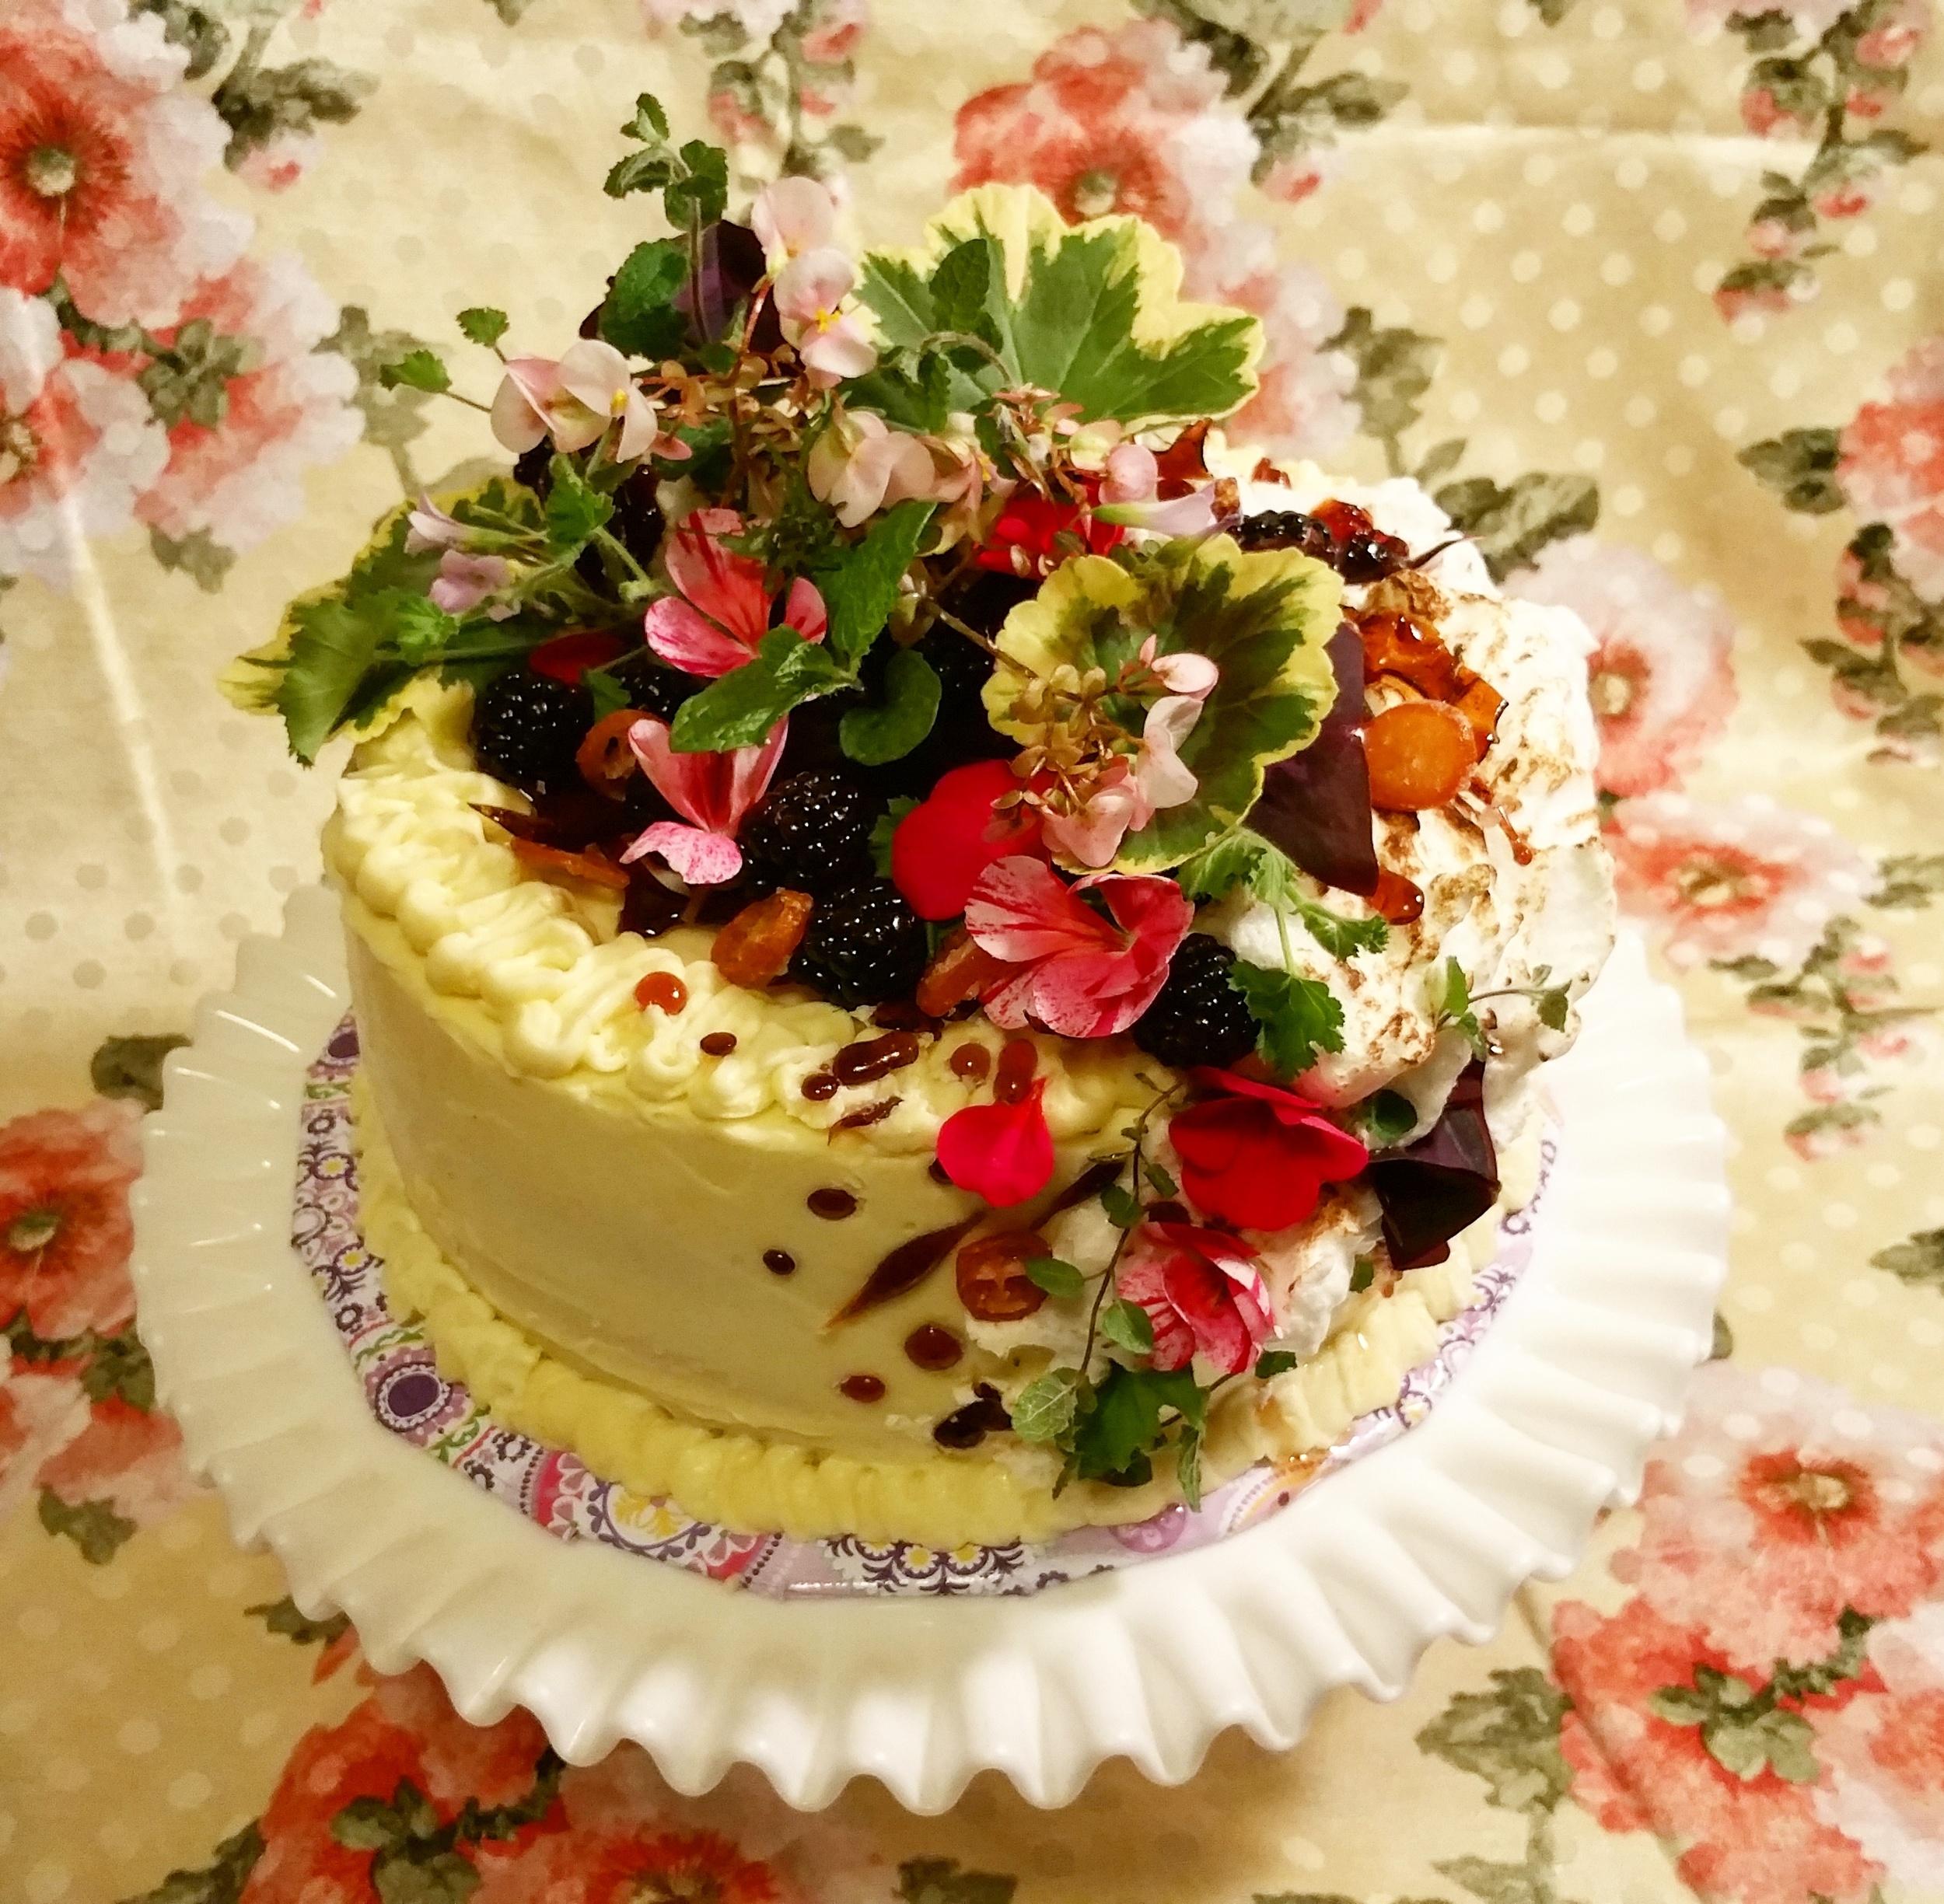 beautifulcake.jpg